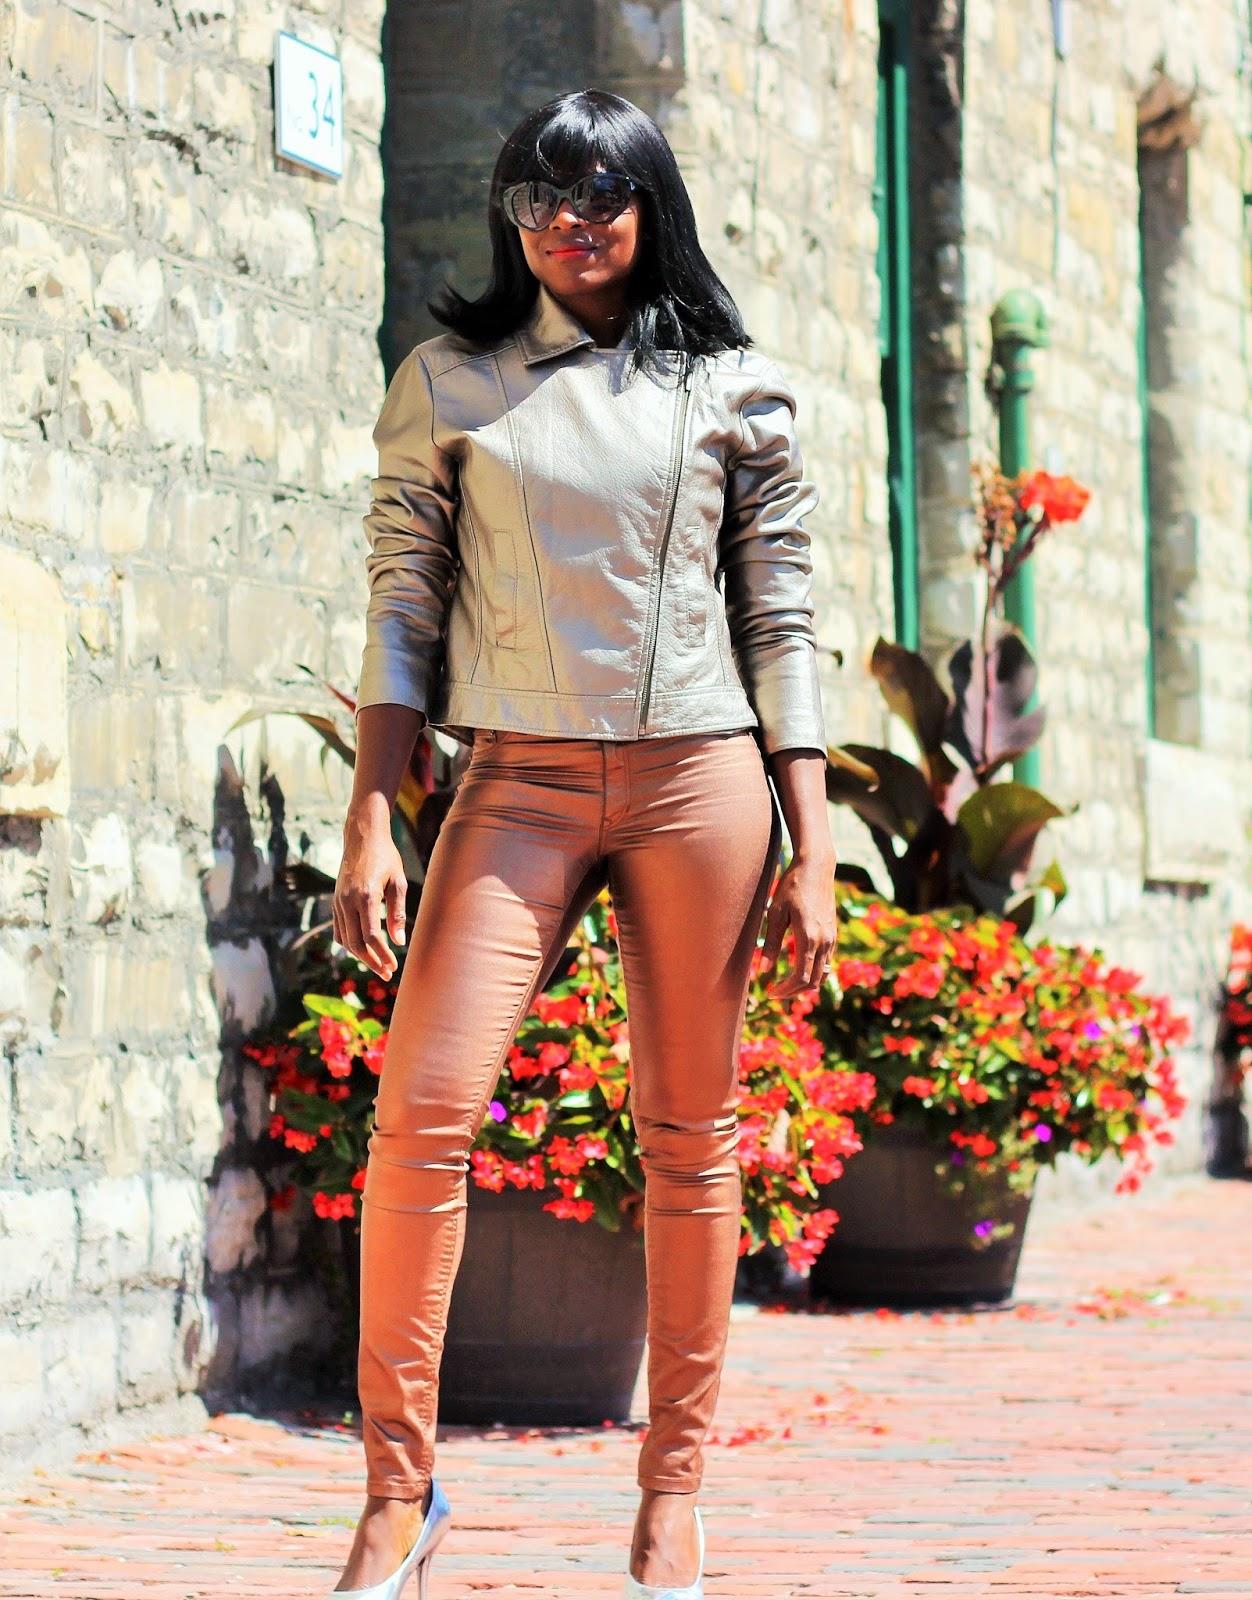 Metallic Gold Jacket Styled With Metallic Gold Pants